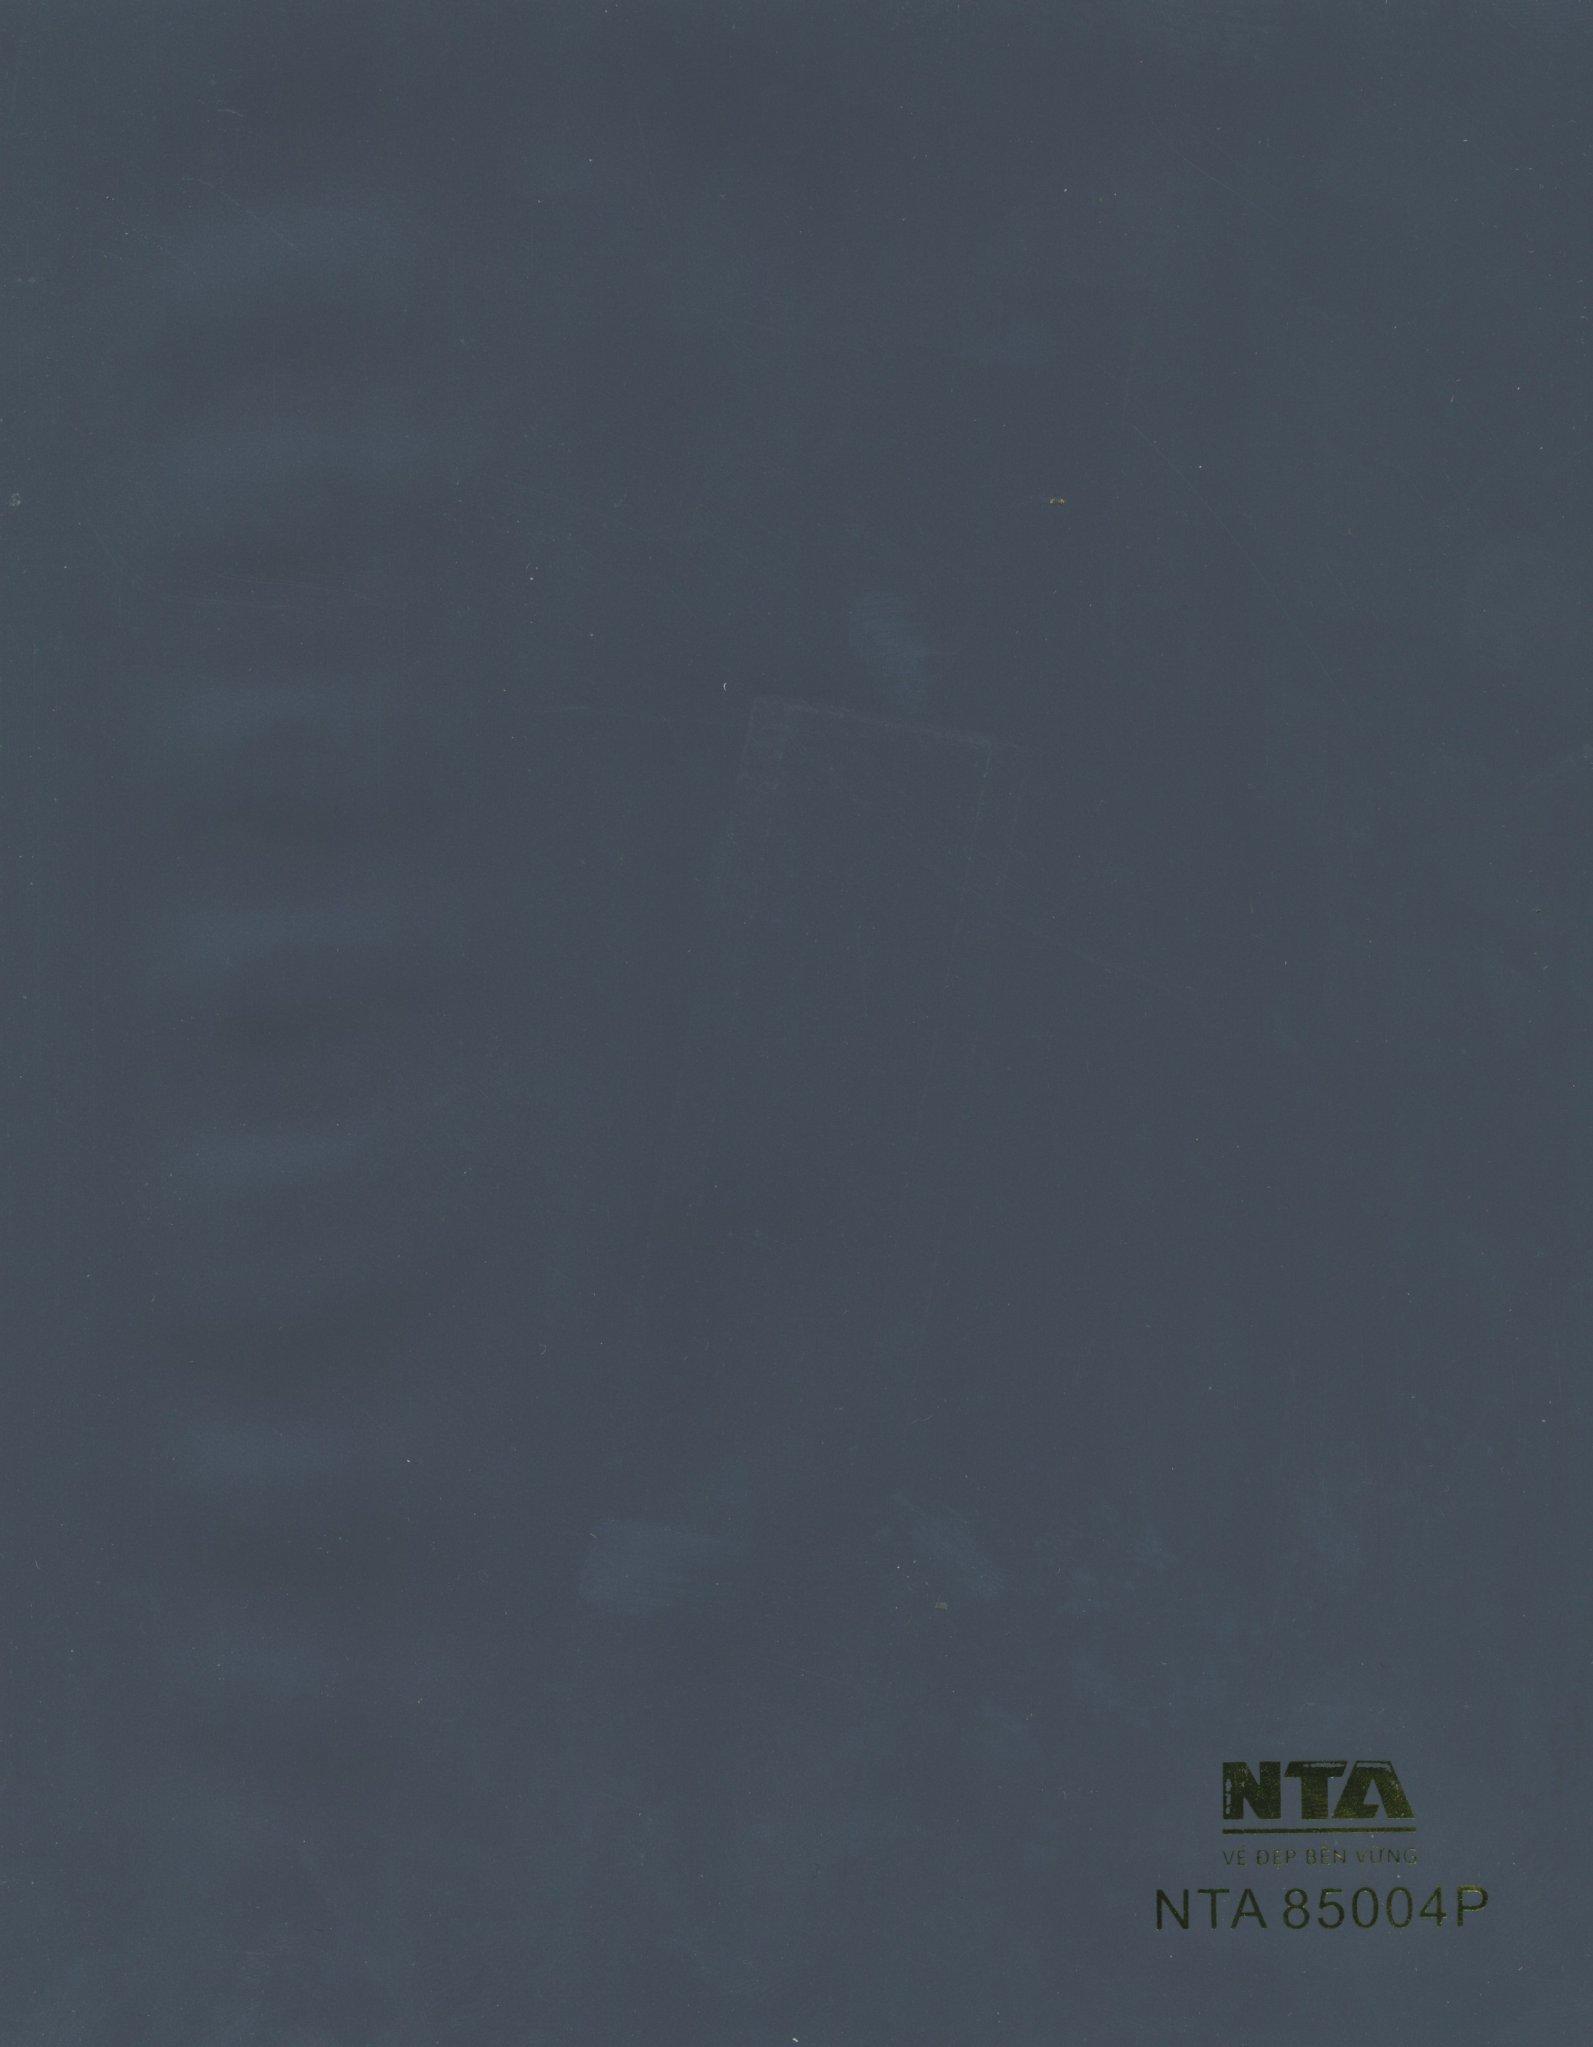 tam-op-tran-tuong-85004p